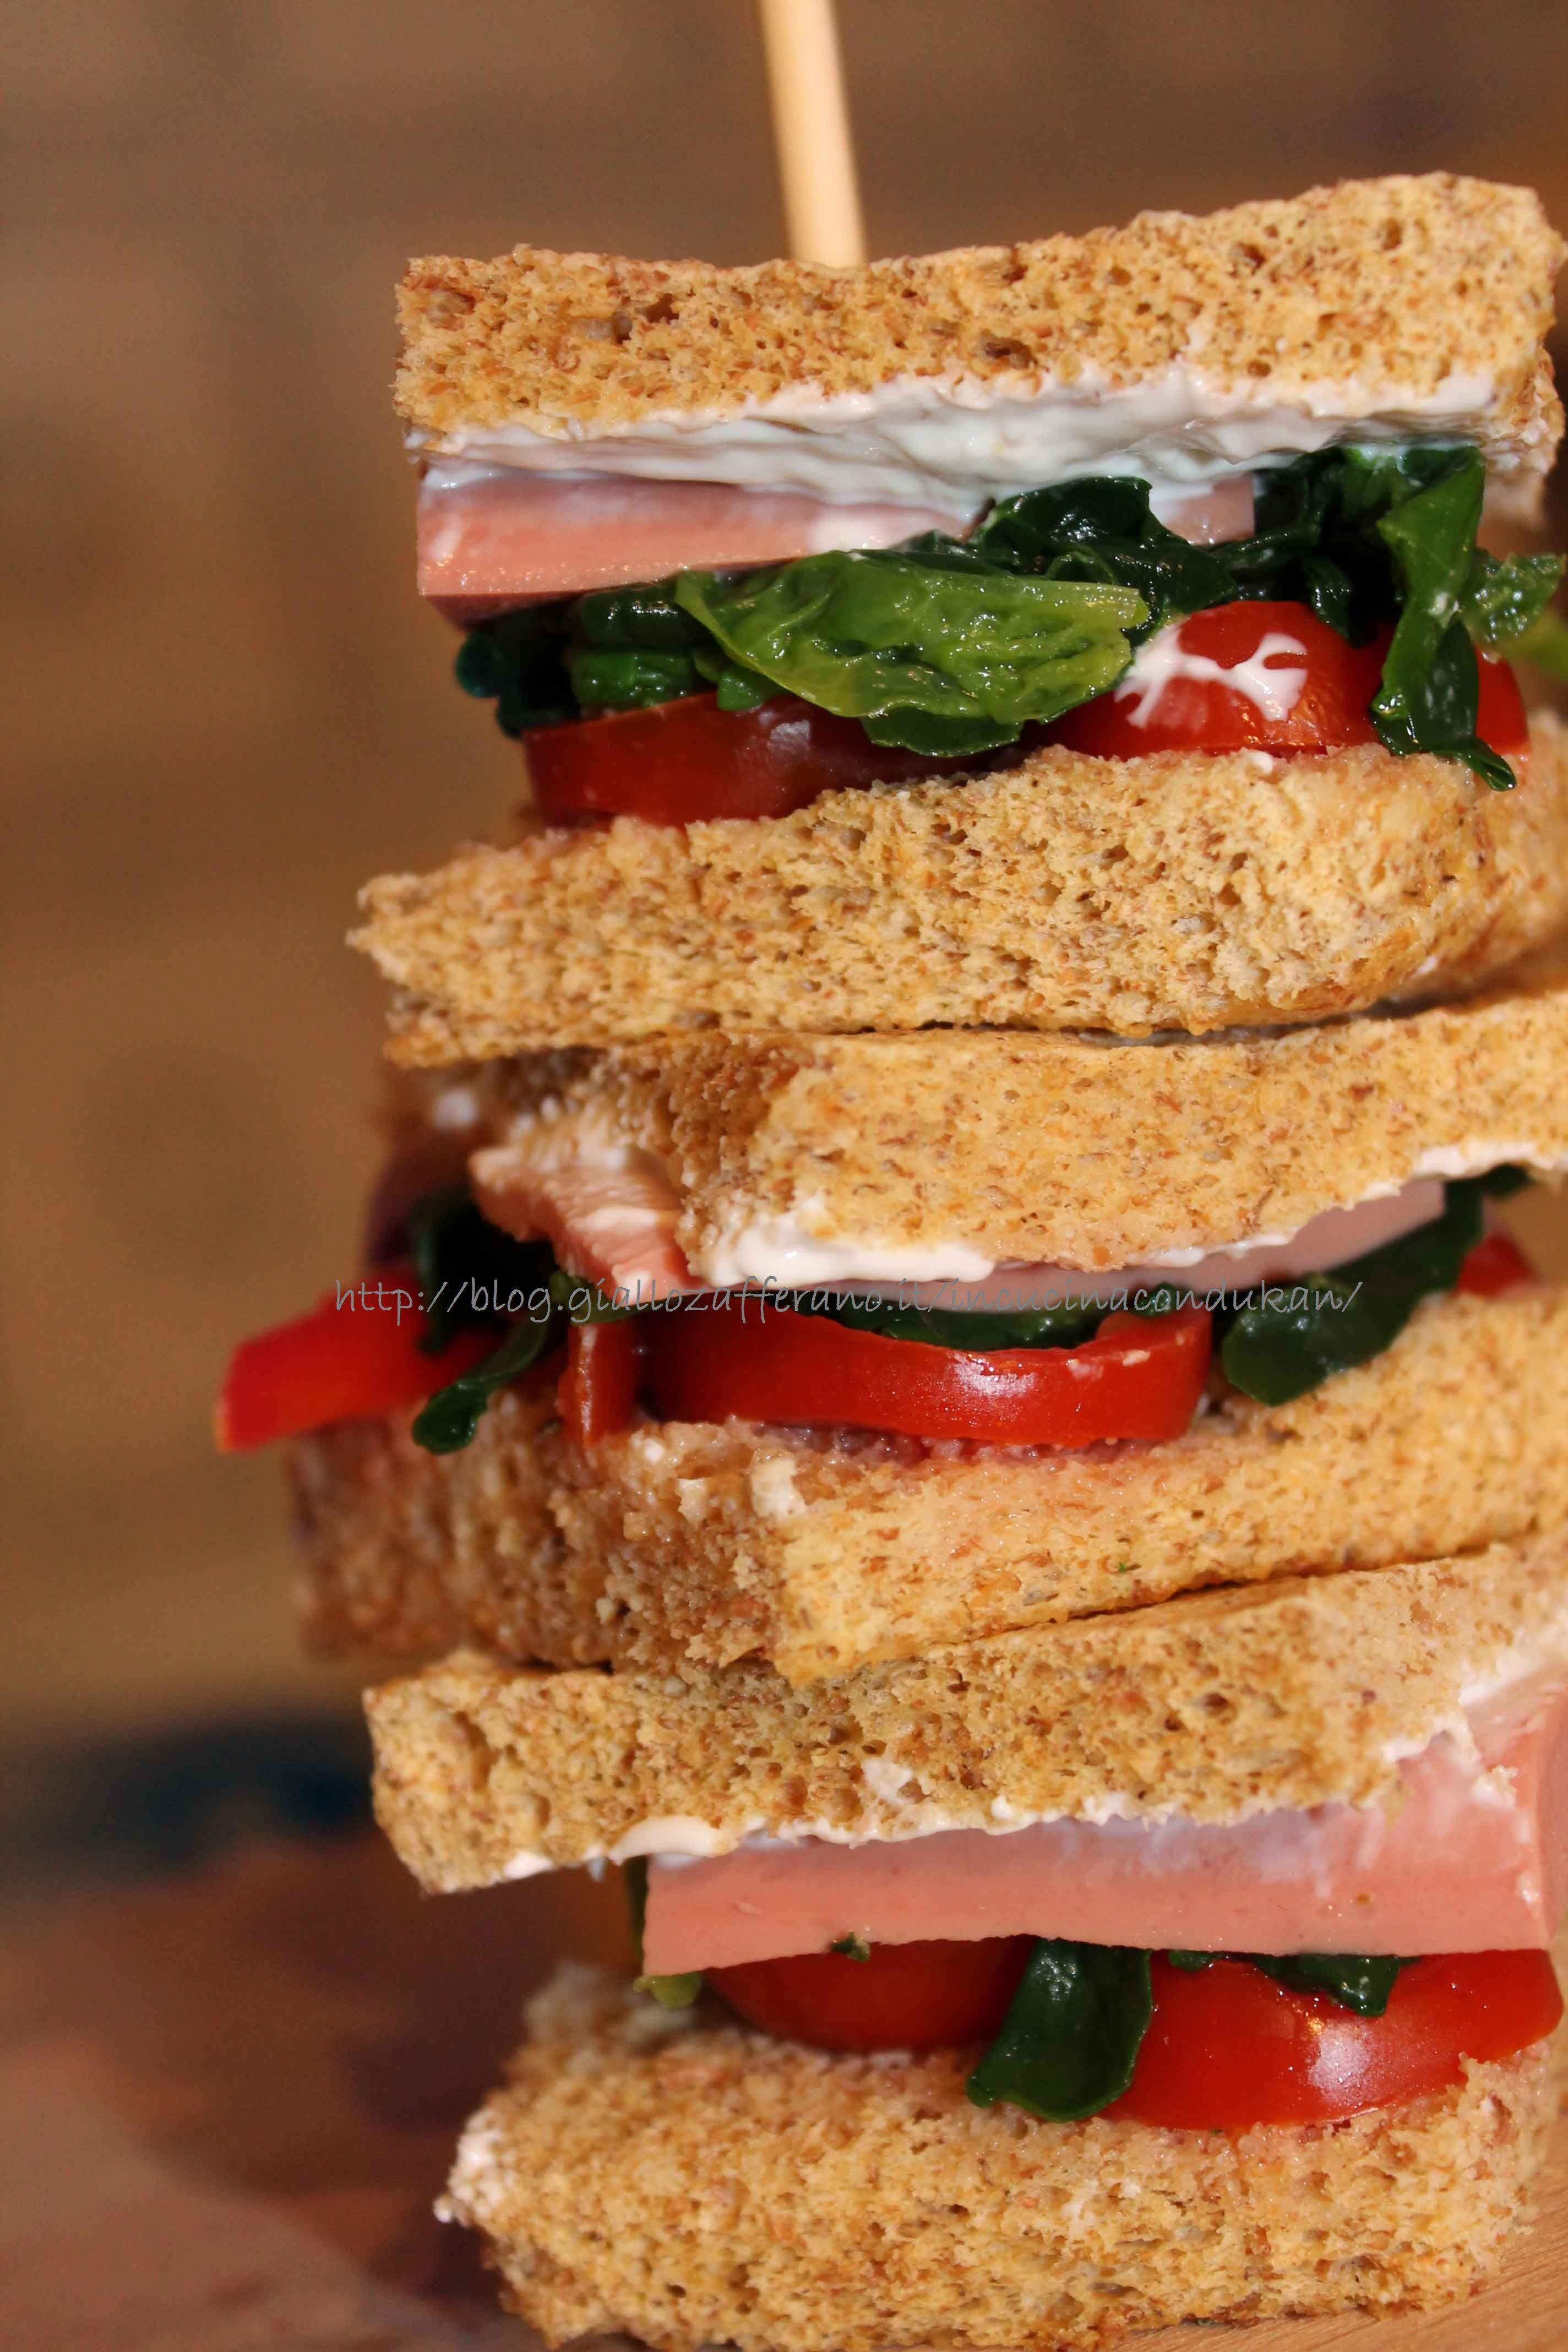 dimagrimento con la dieta a sandwich